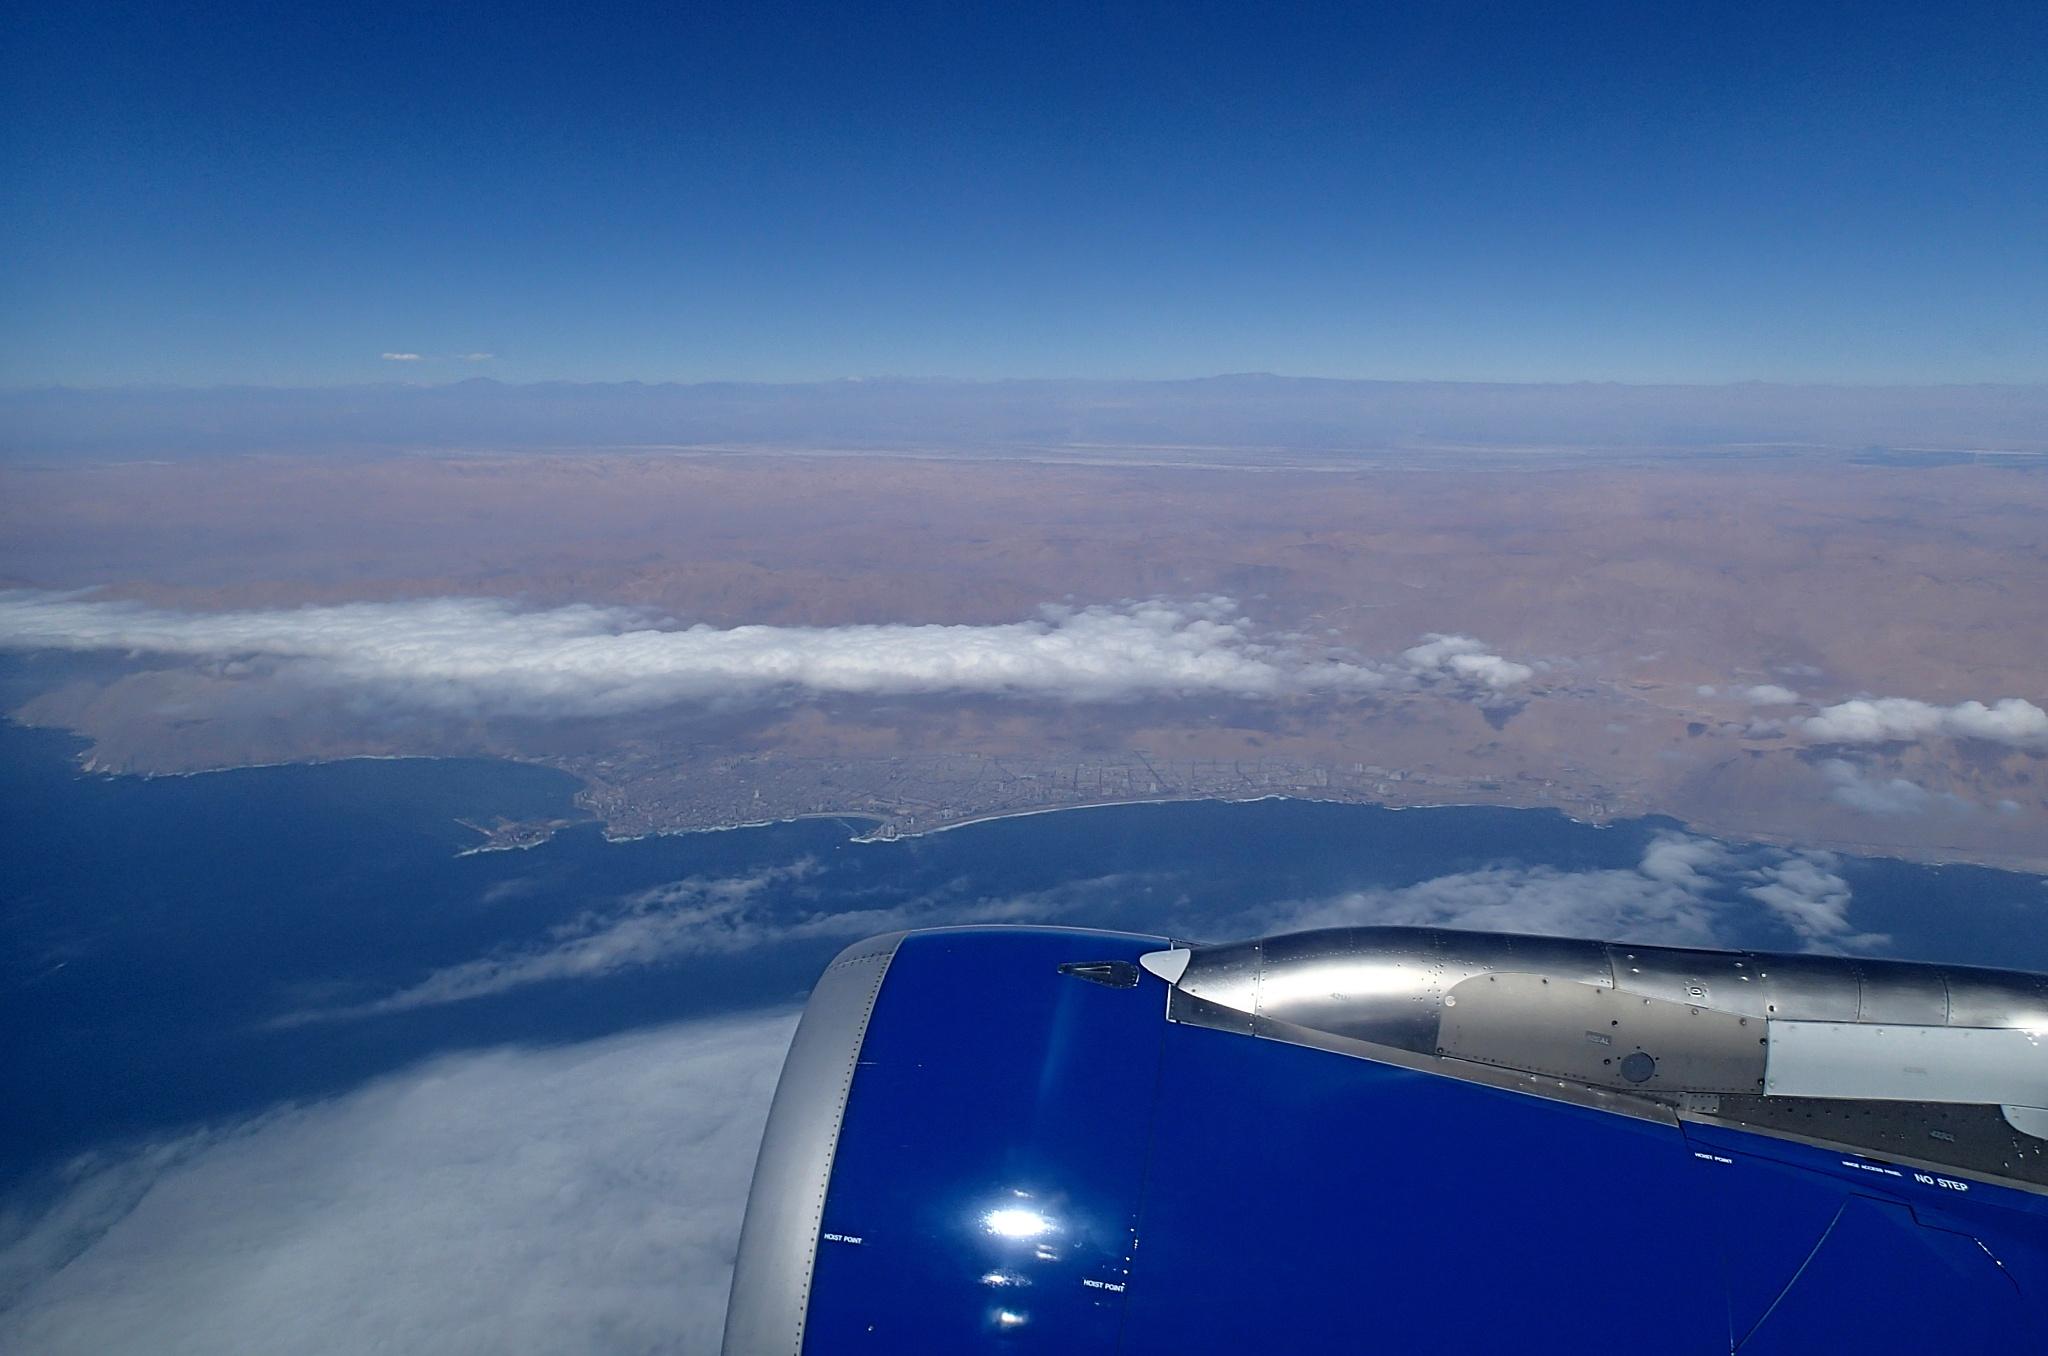 Letíme na sever do Ariky